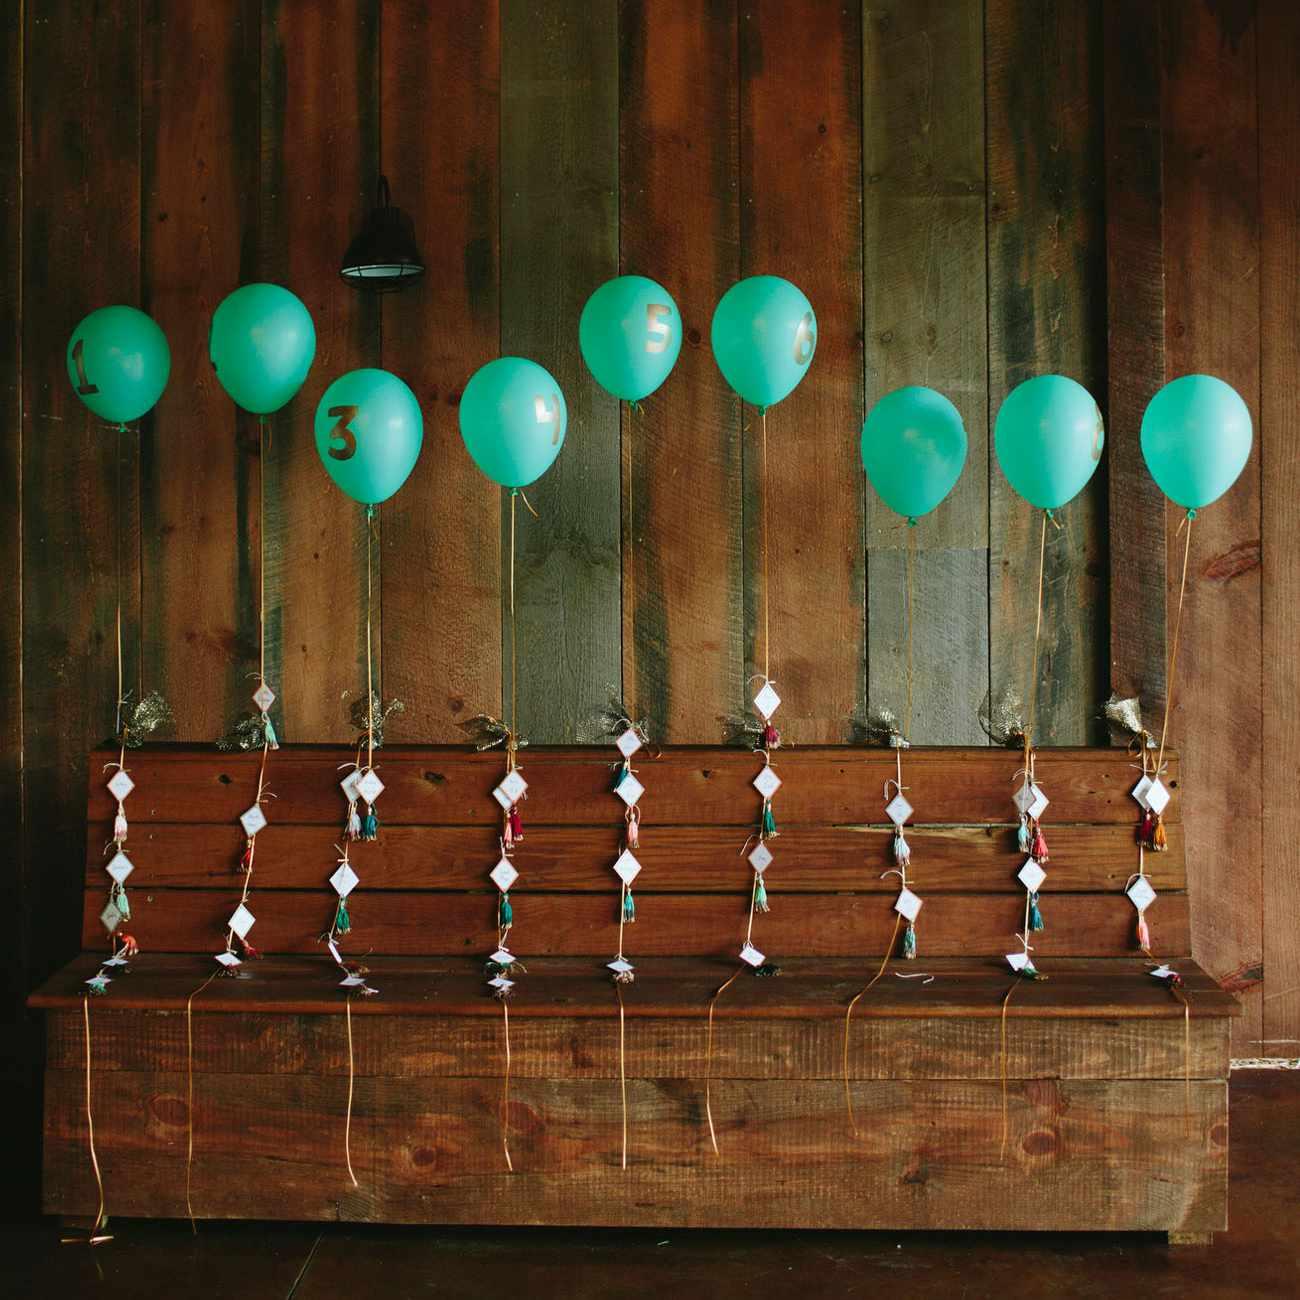 Balloon seating chart